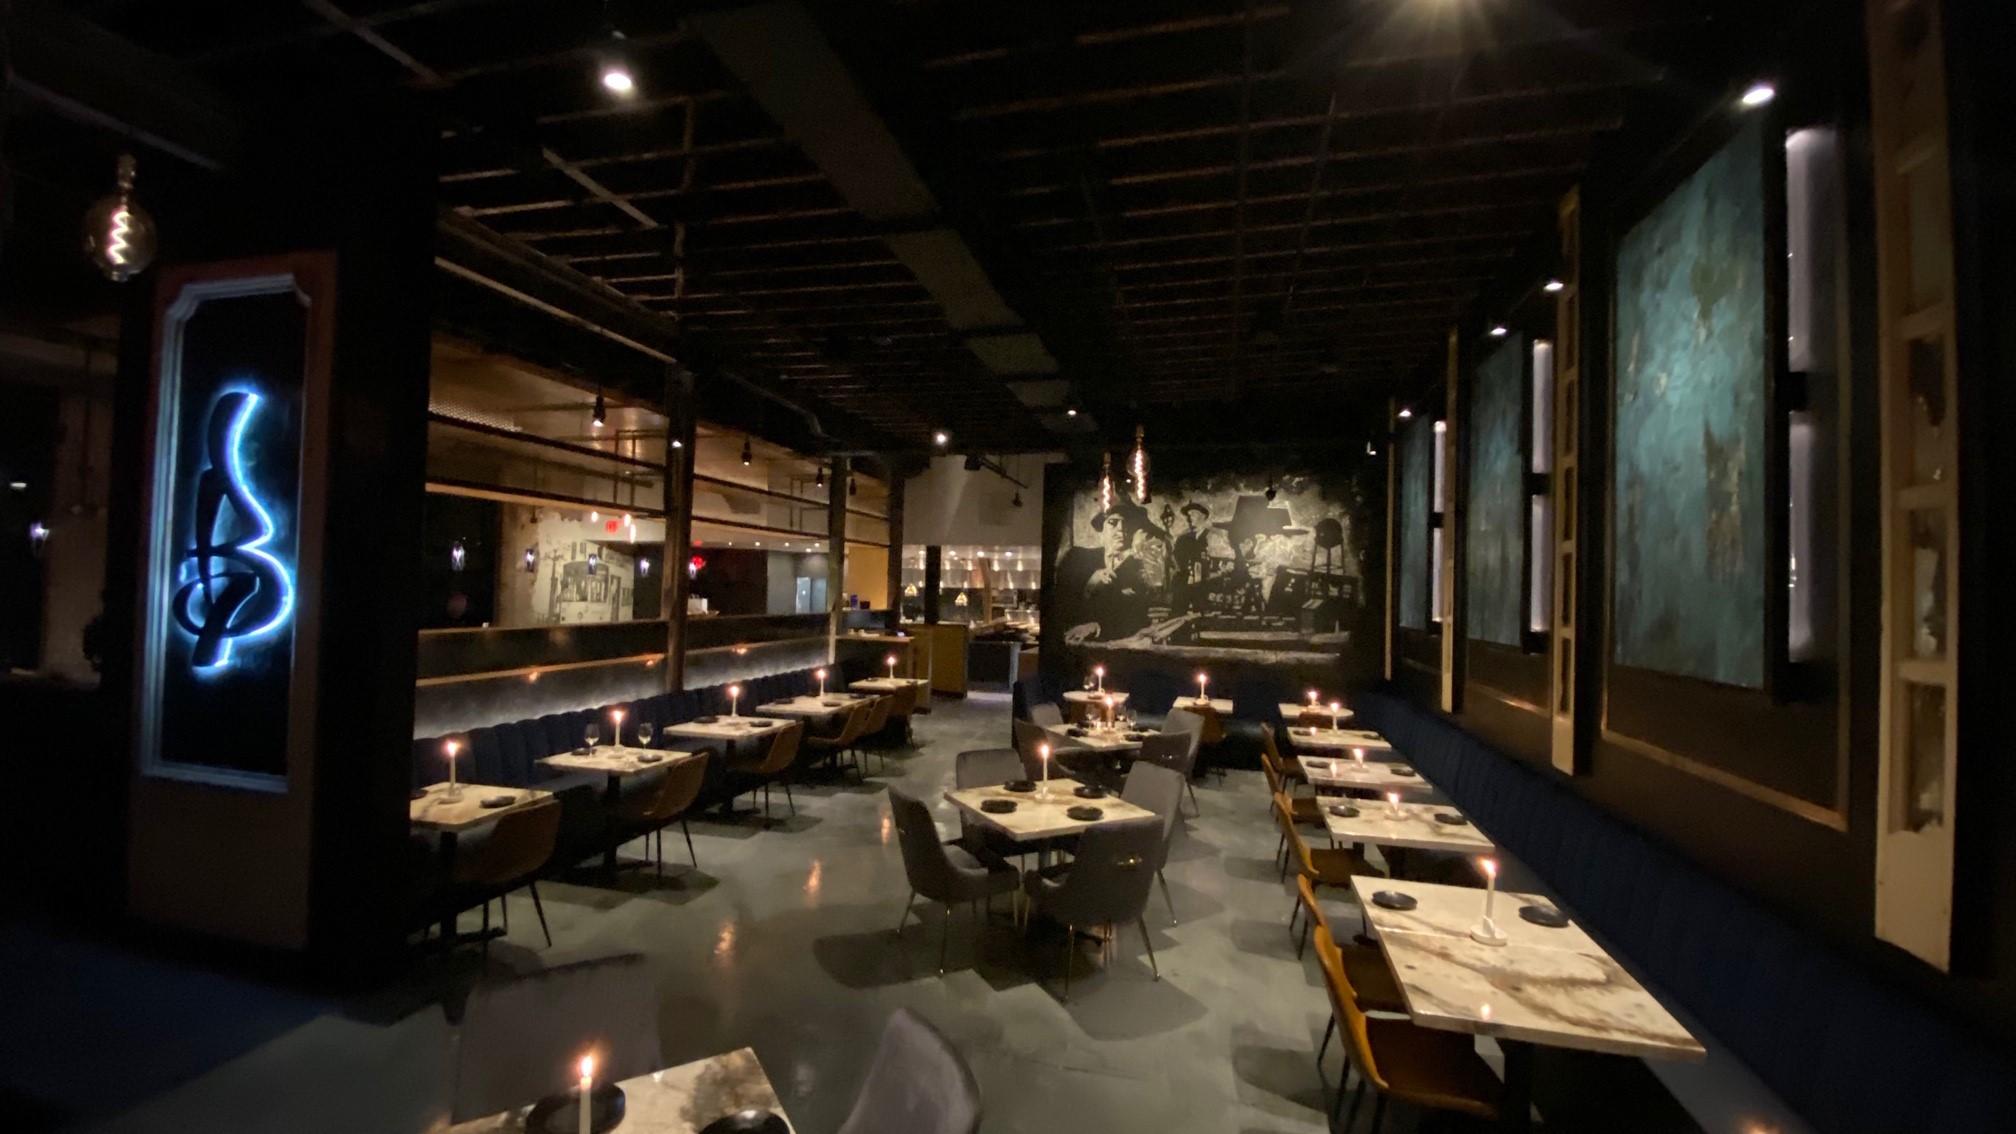 New Ybor City Restaurant Barterhouse Will Focus On